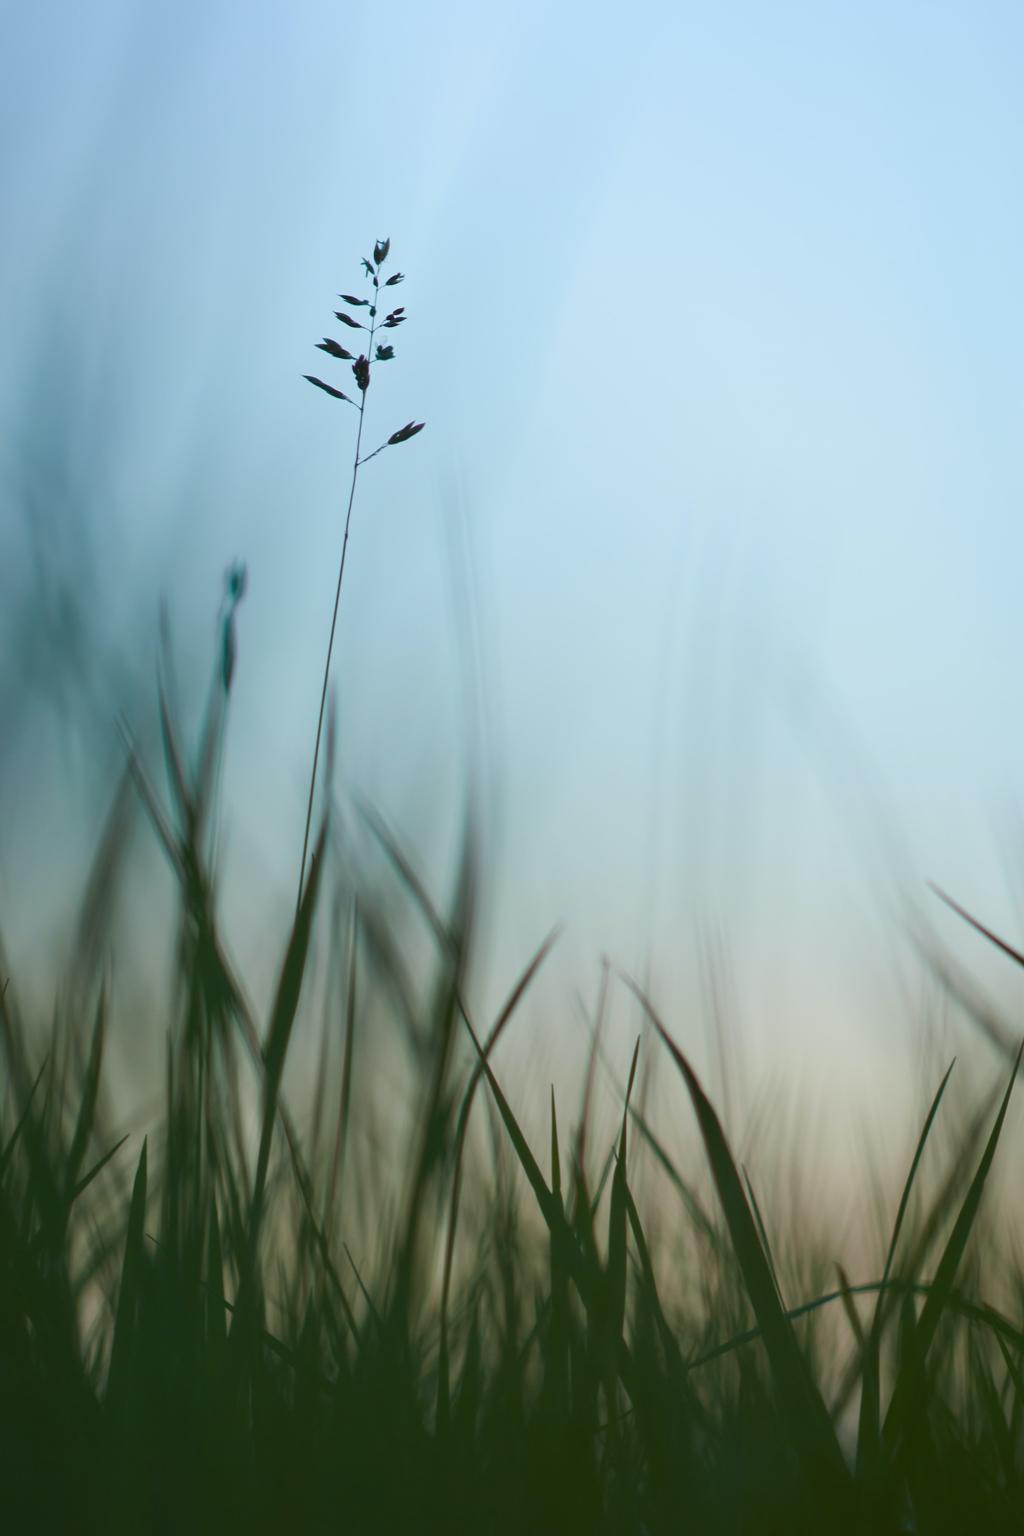 tall grass against a blue sky